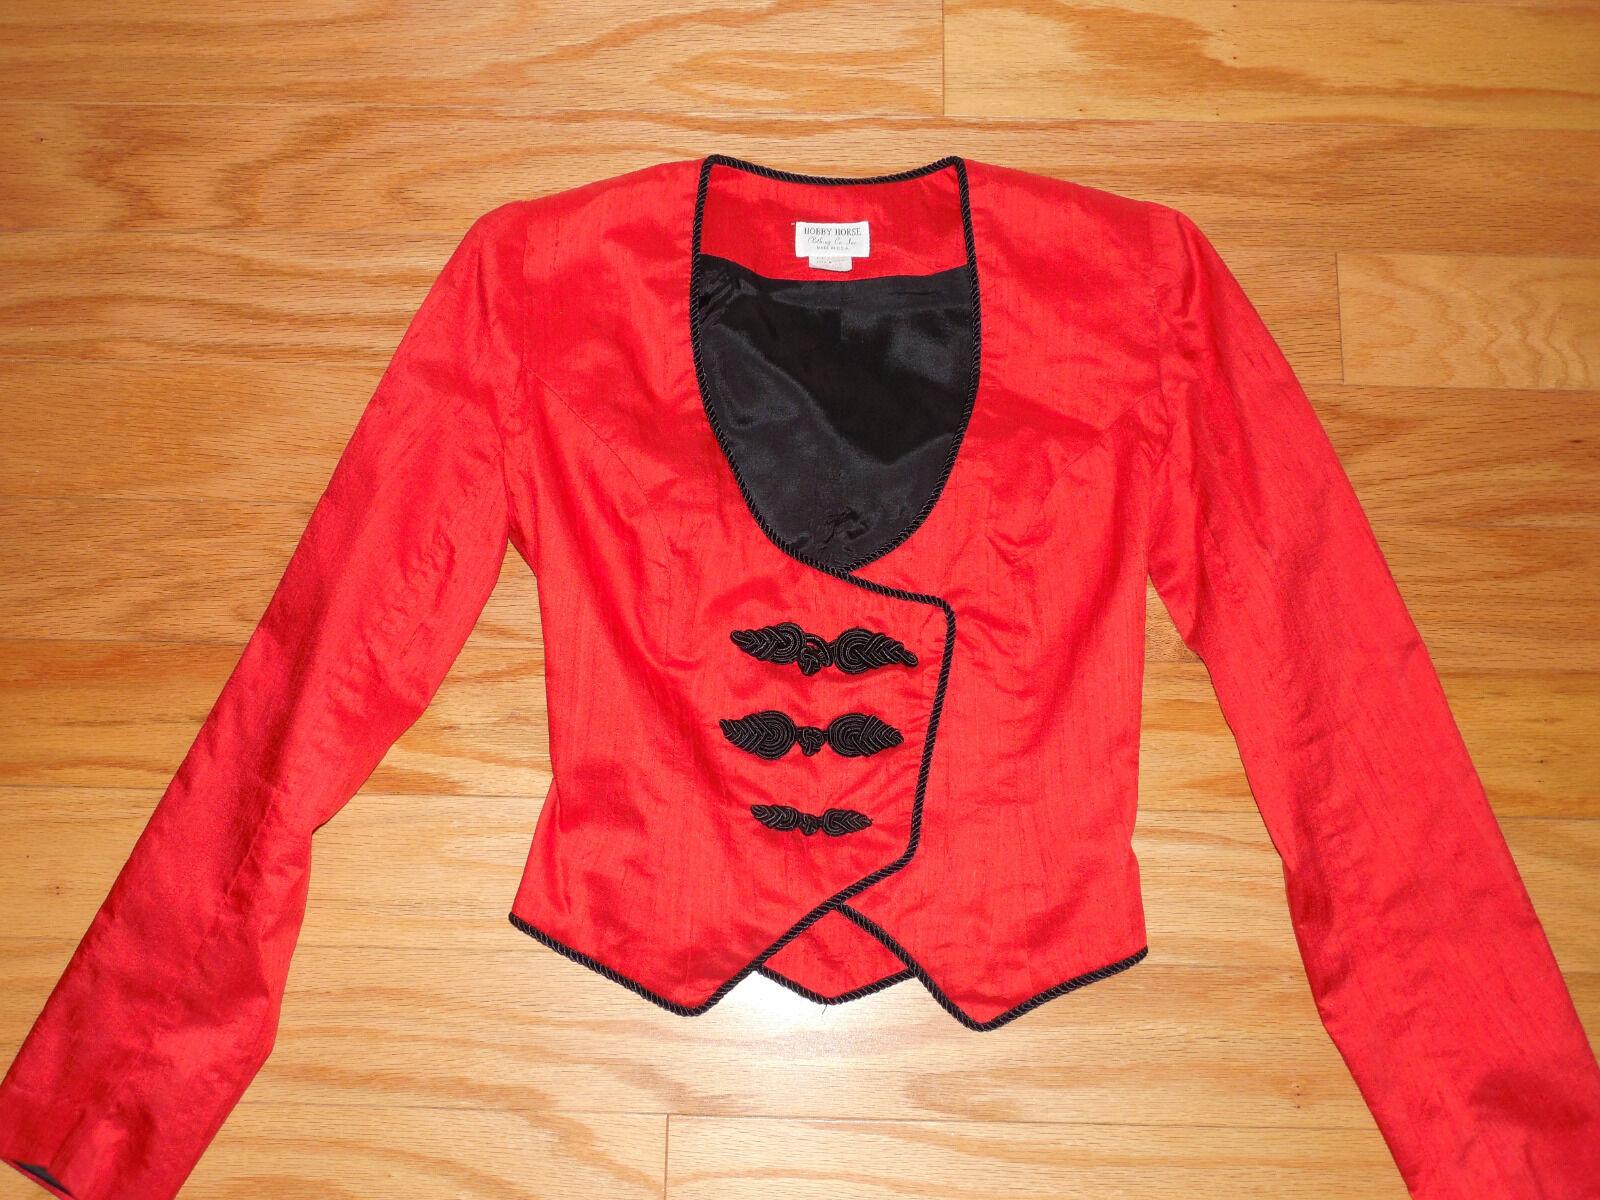 Señoras Seda Roja Western Show Placer Corset Estilo chaqueta Hobby Horse Petite